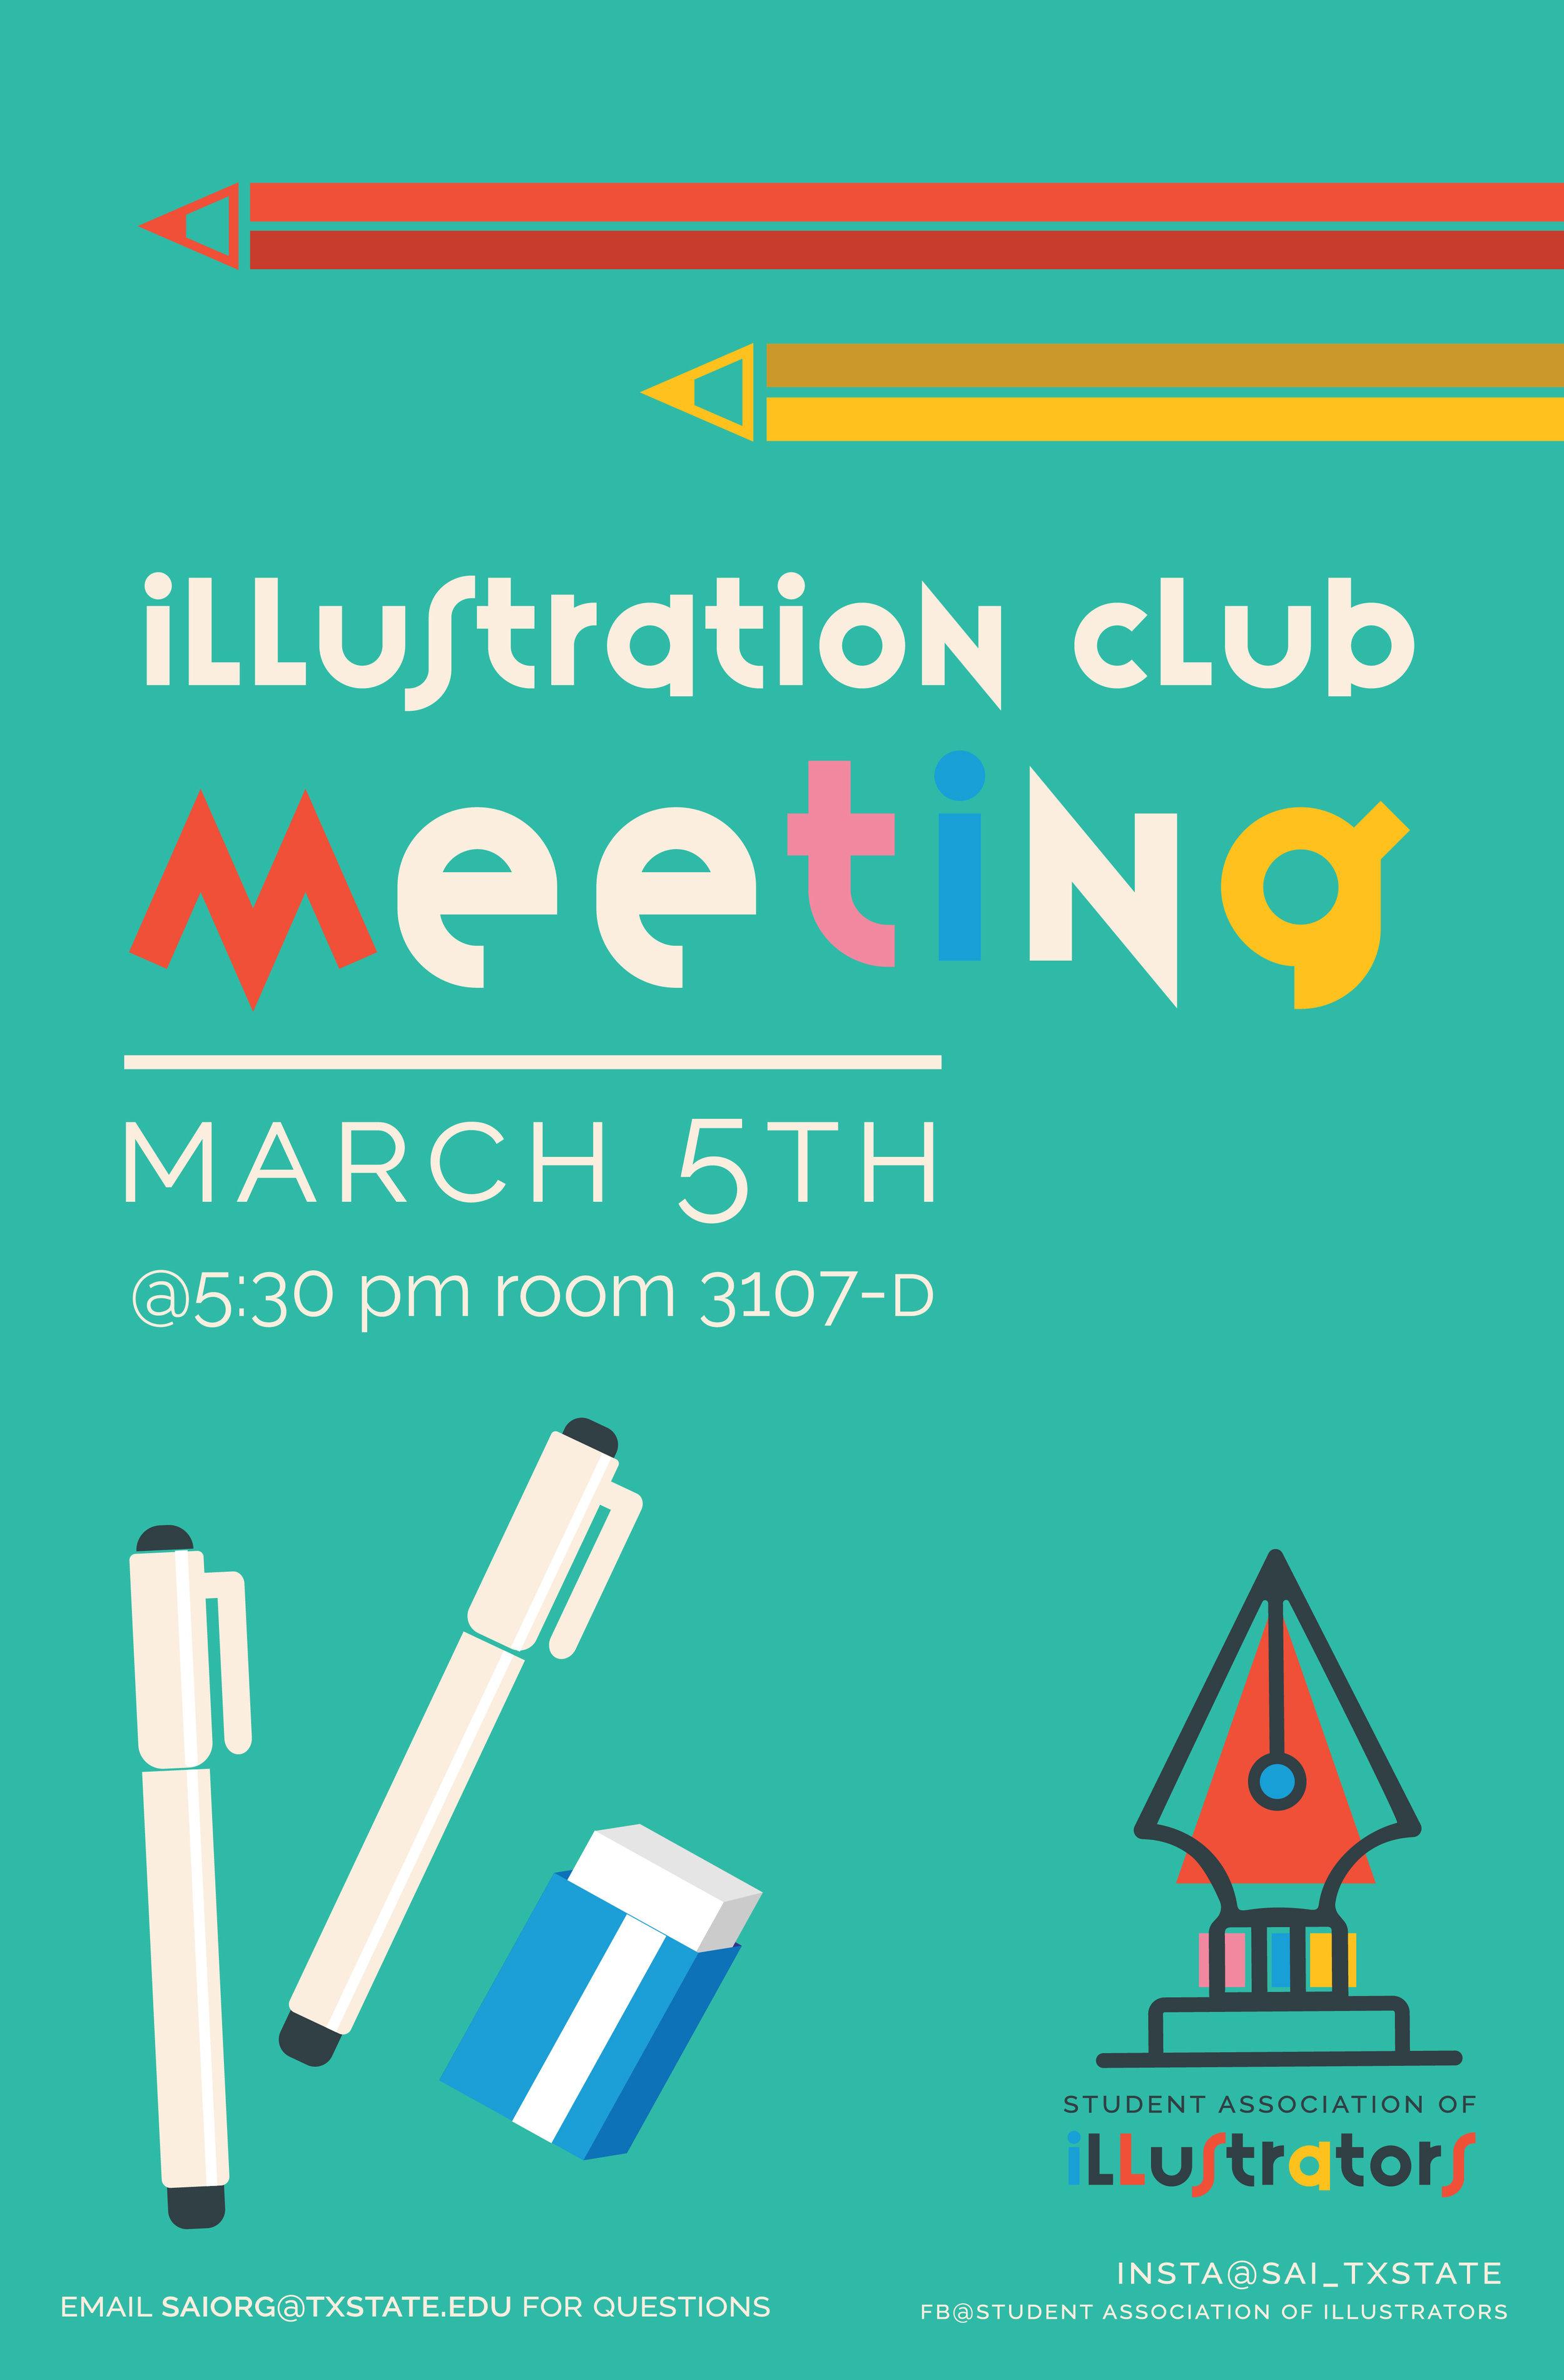 illustrationclubmeeting-01.jpg